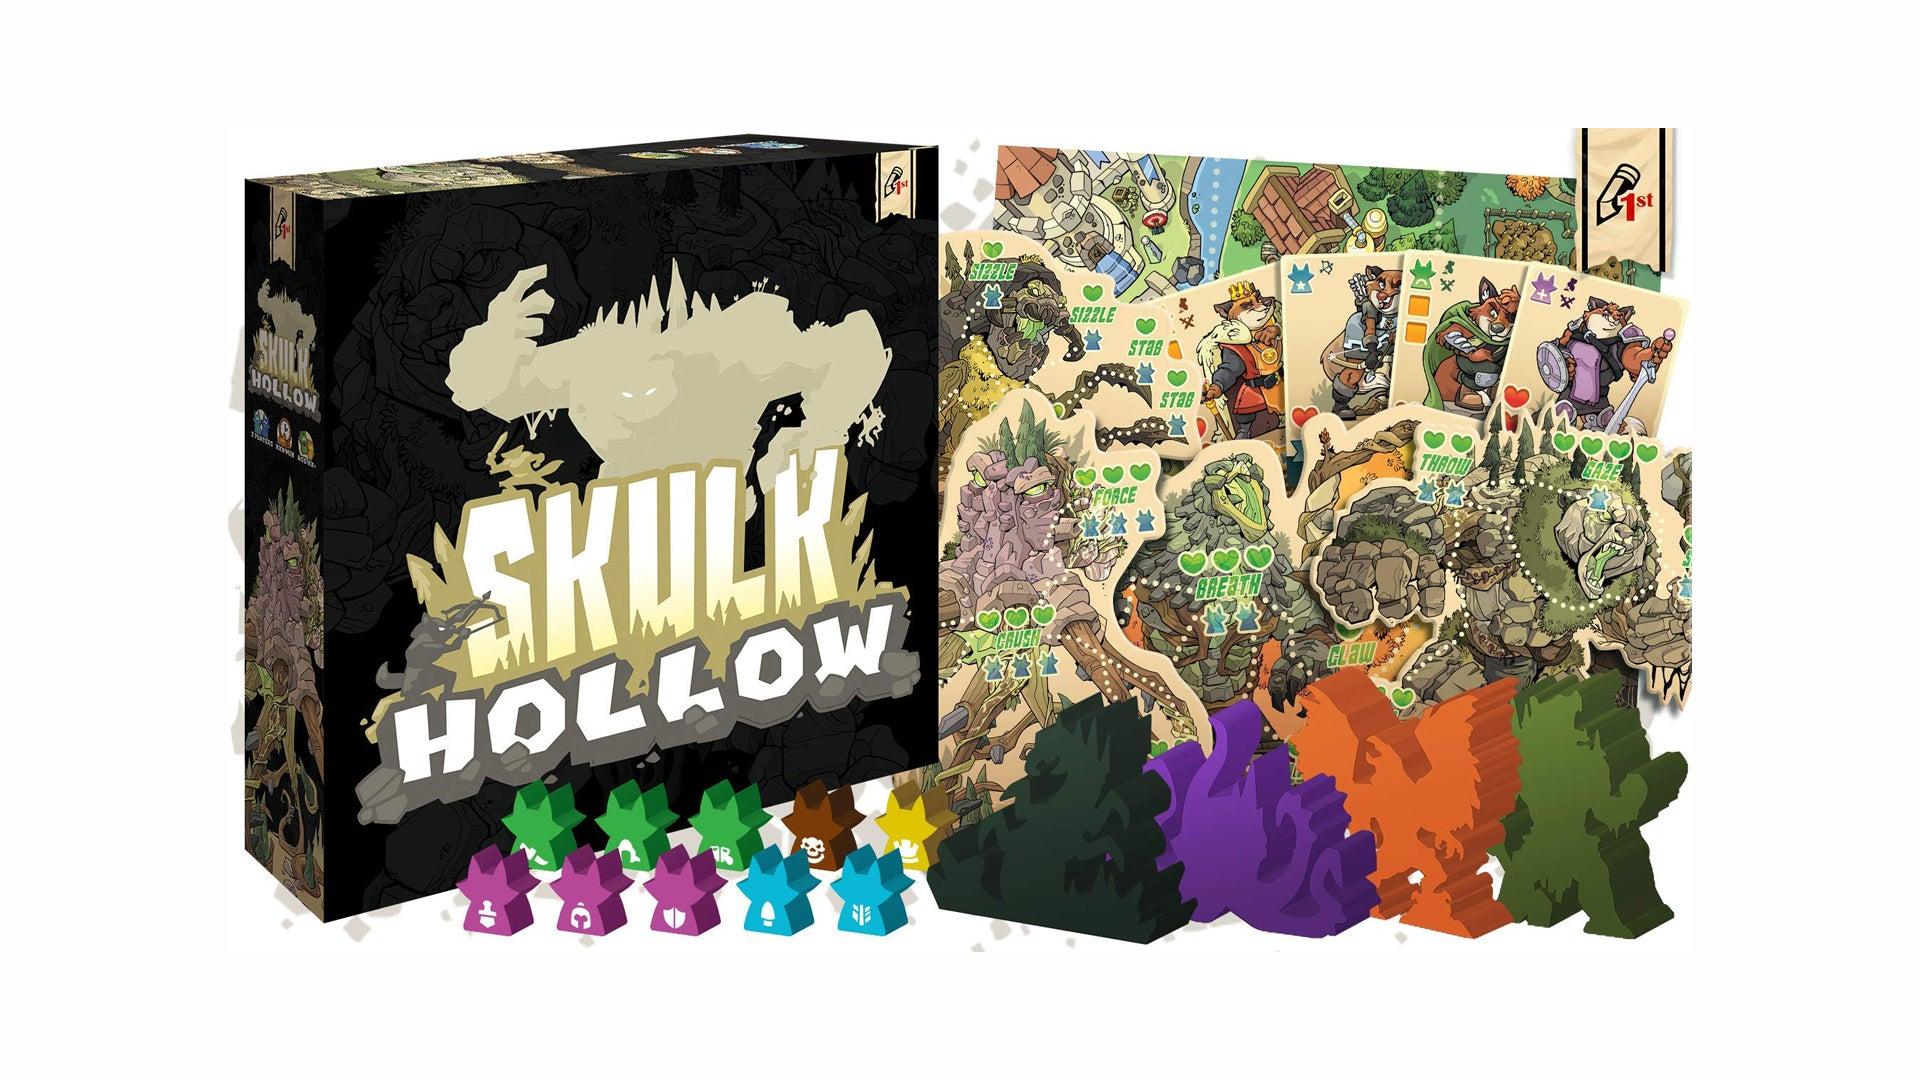 Skulk Hollow board game layout